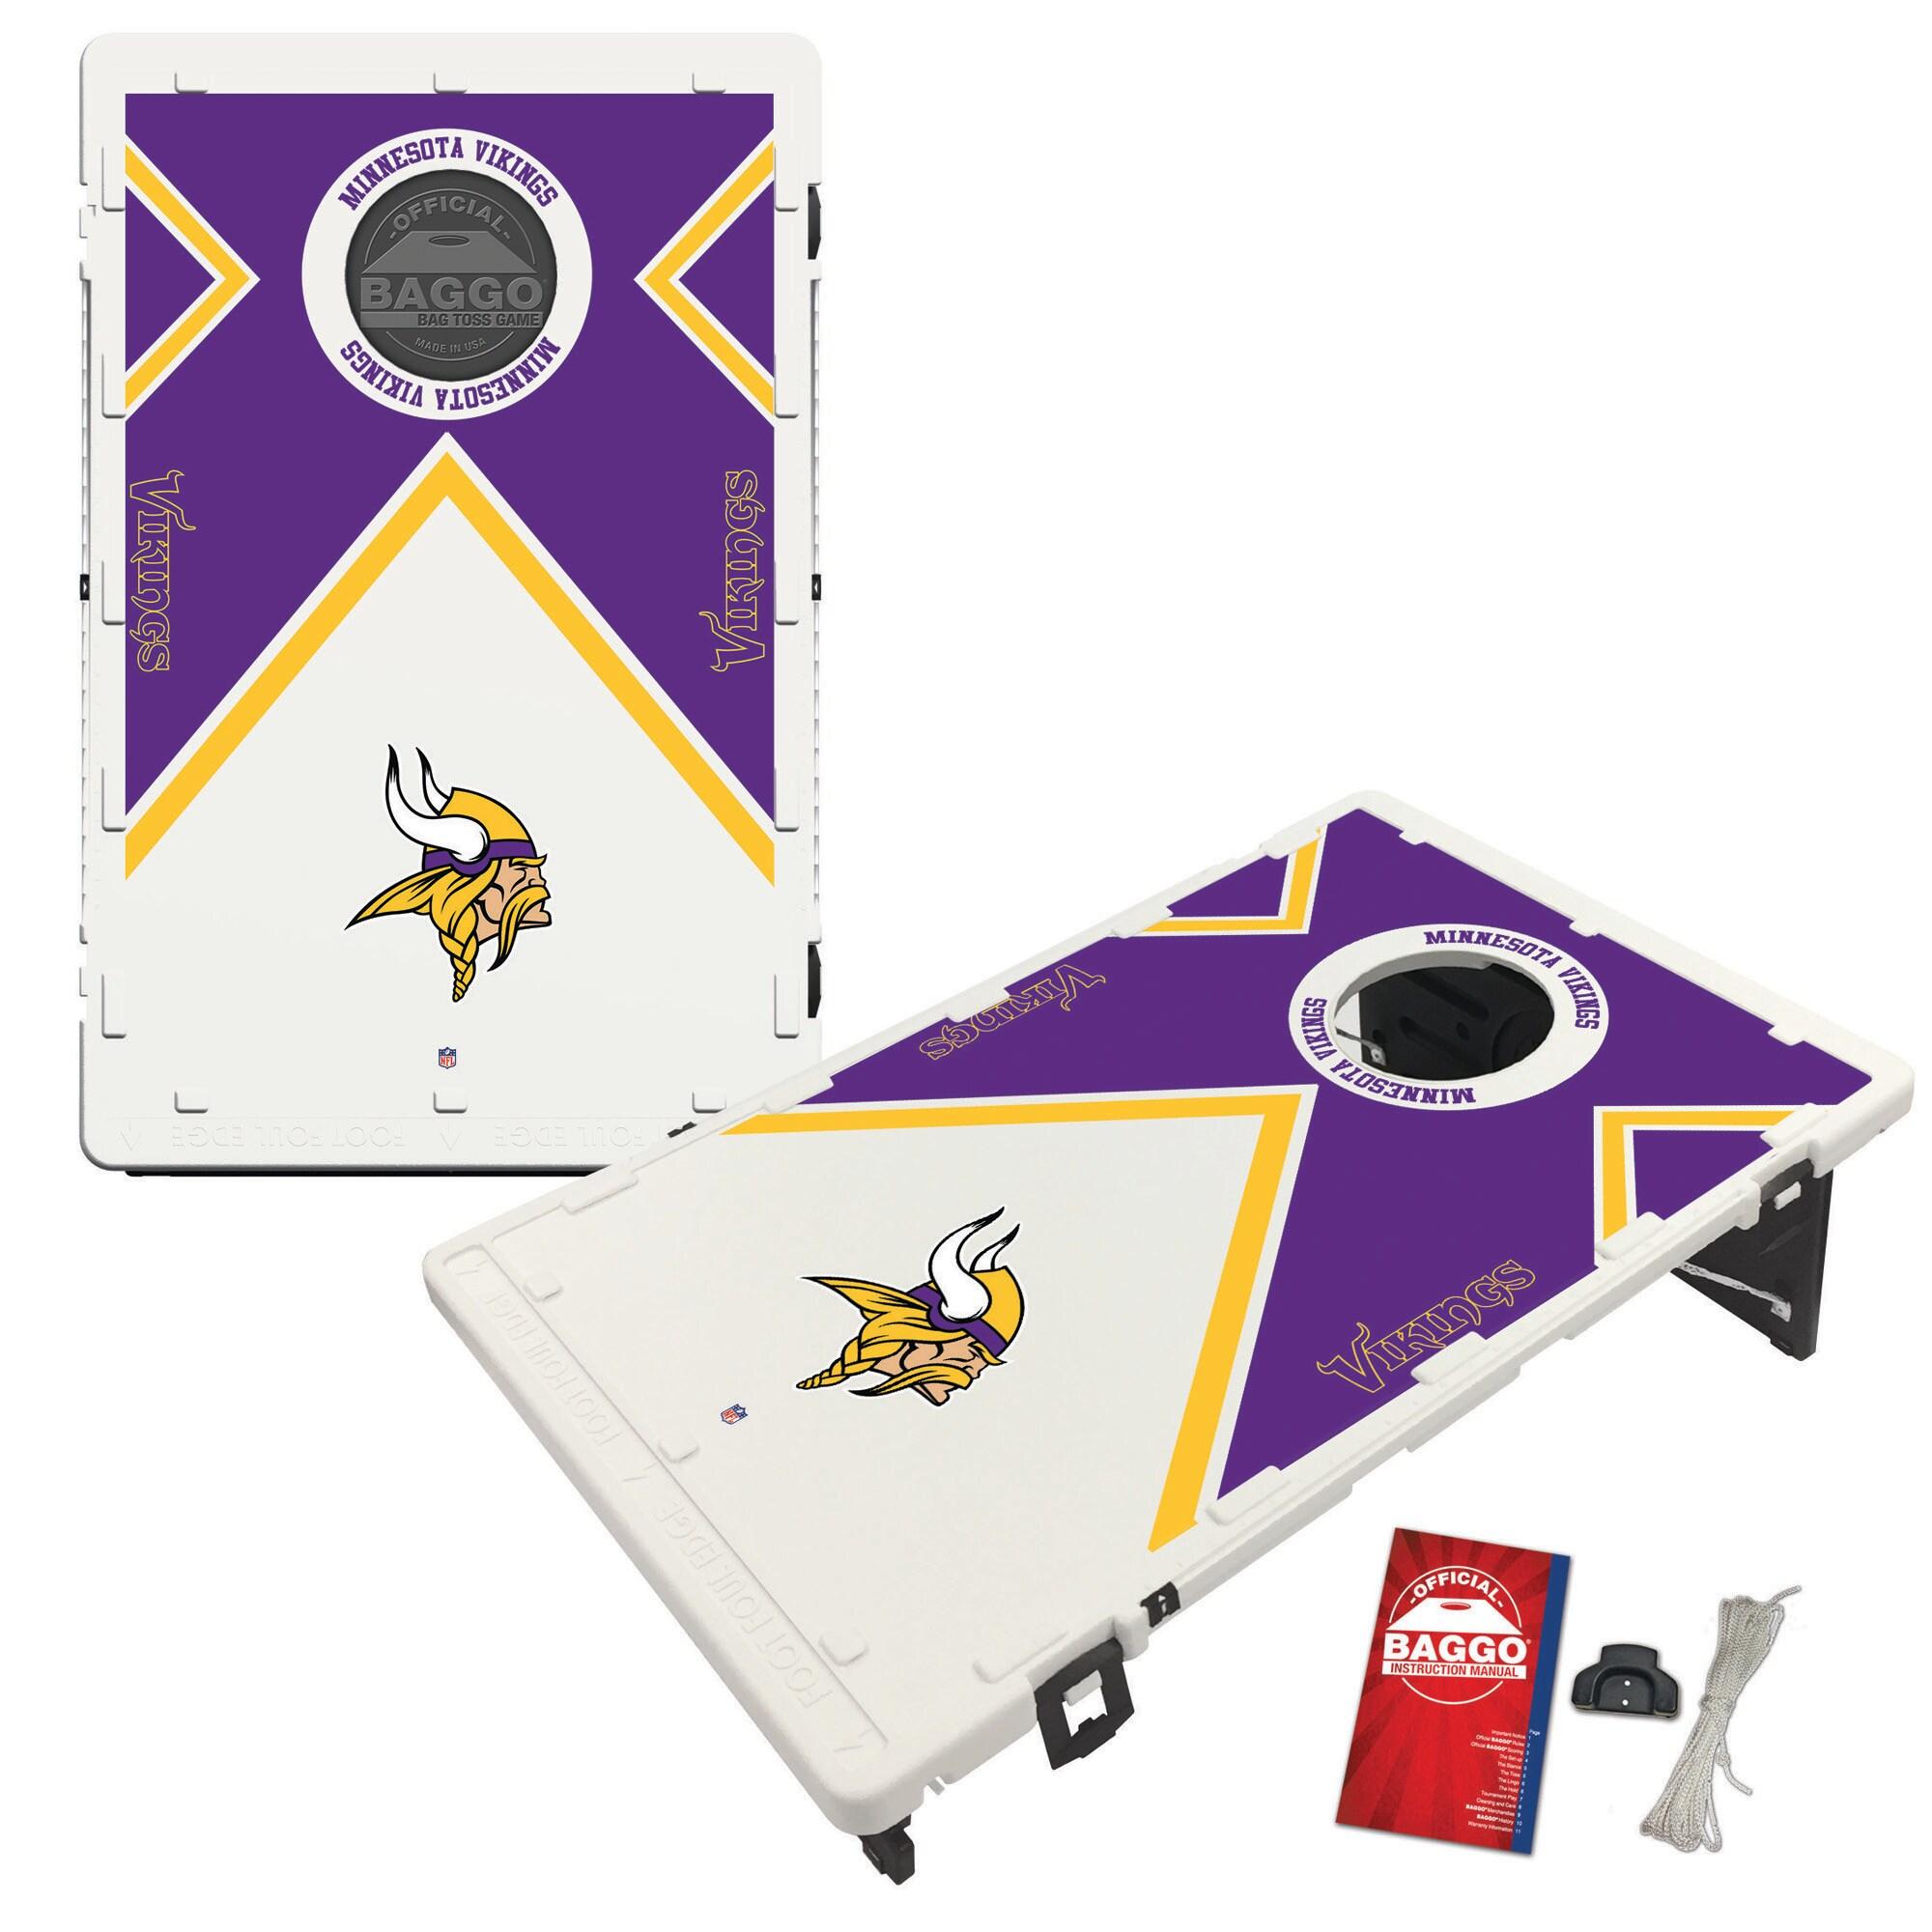 Minnesota Vikings 2' x 3' BAGGO Vintage Cornhole Board Tailgate Toss Set